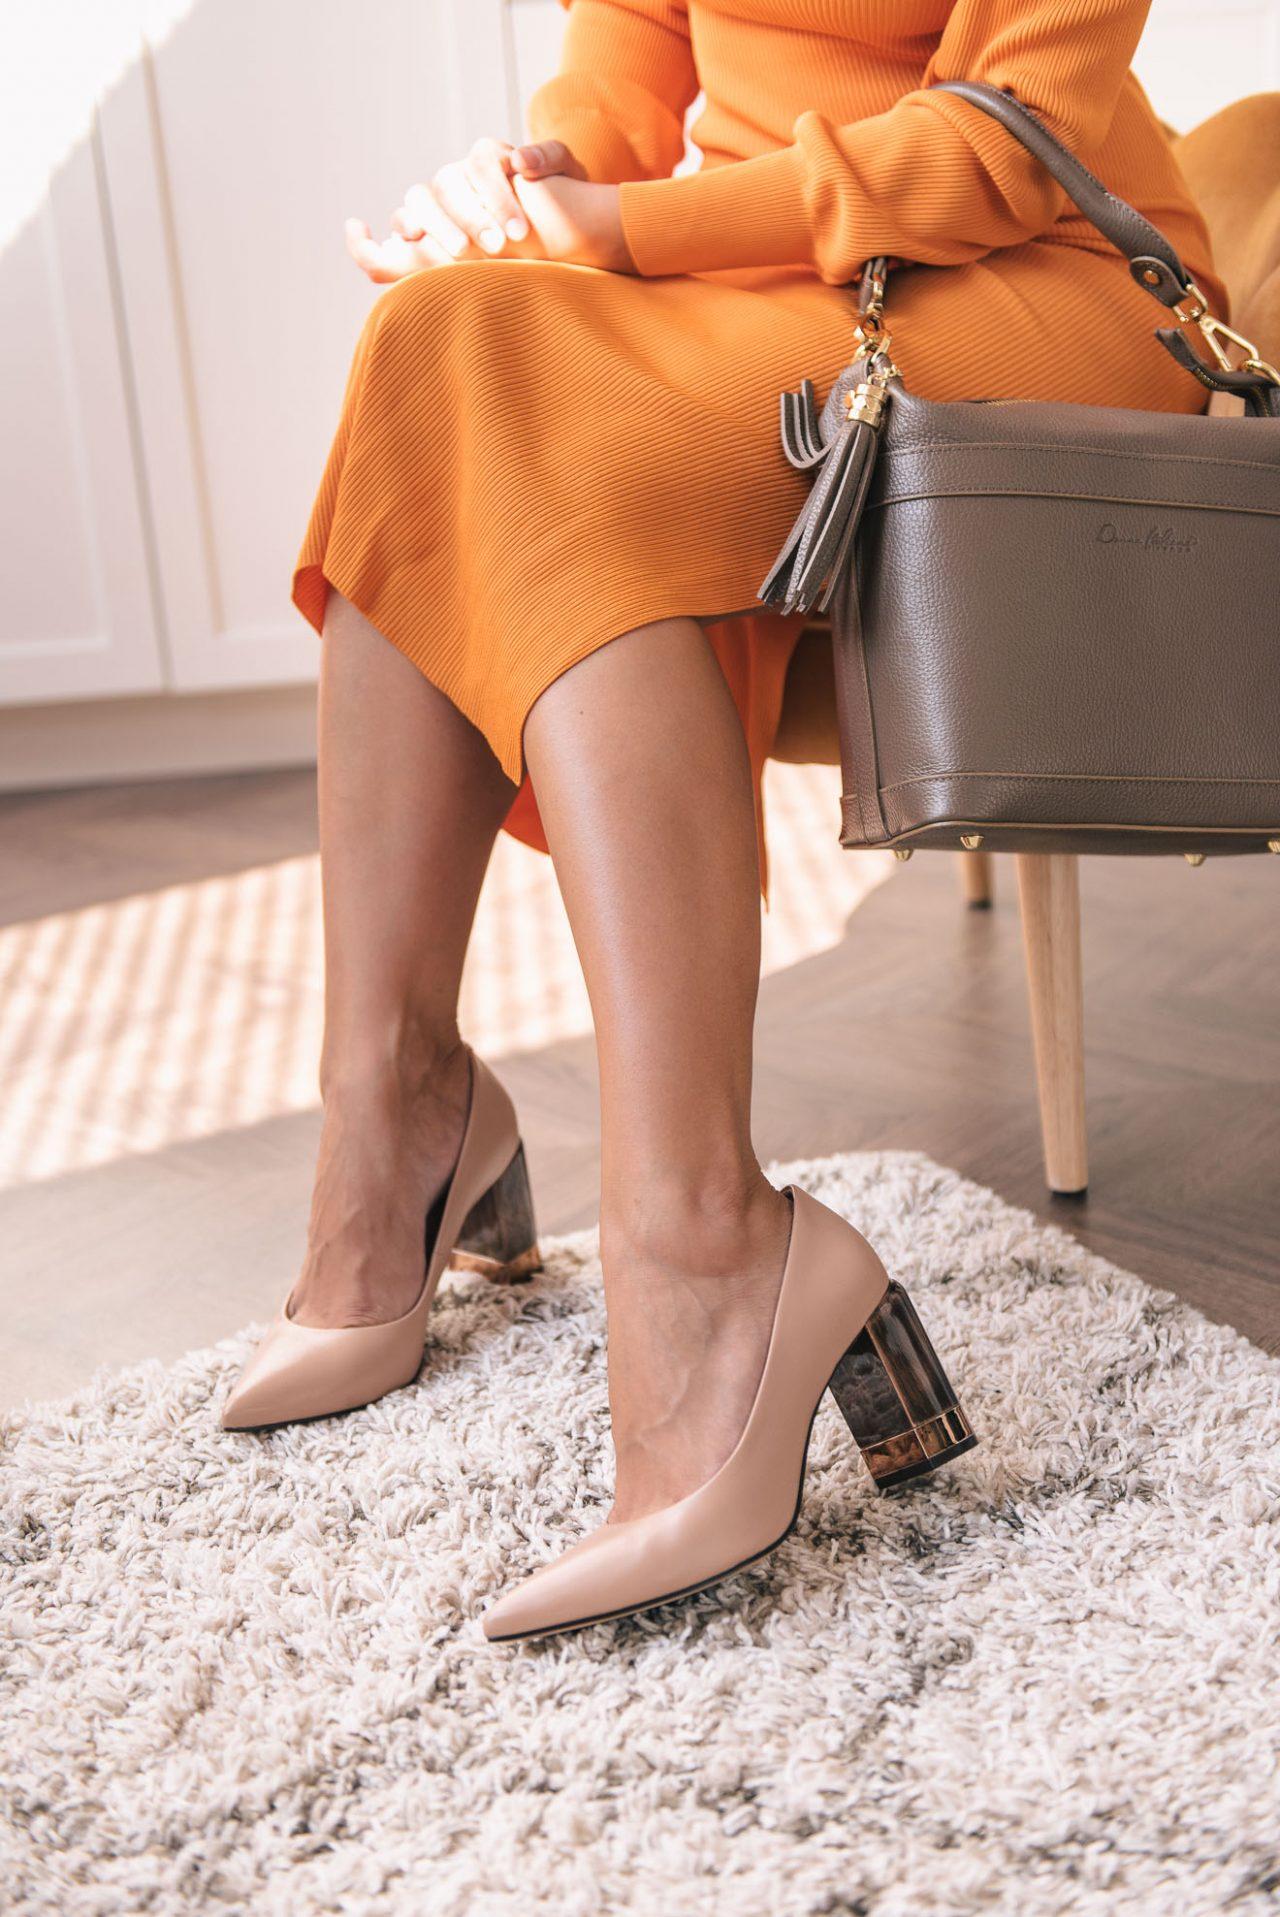 new high heels for this autumn season